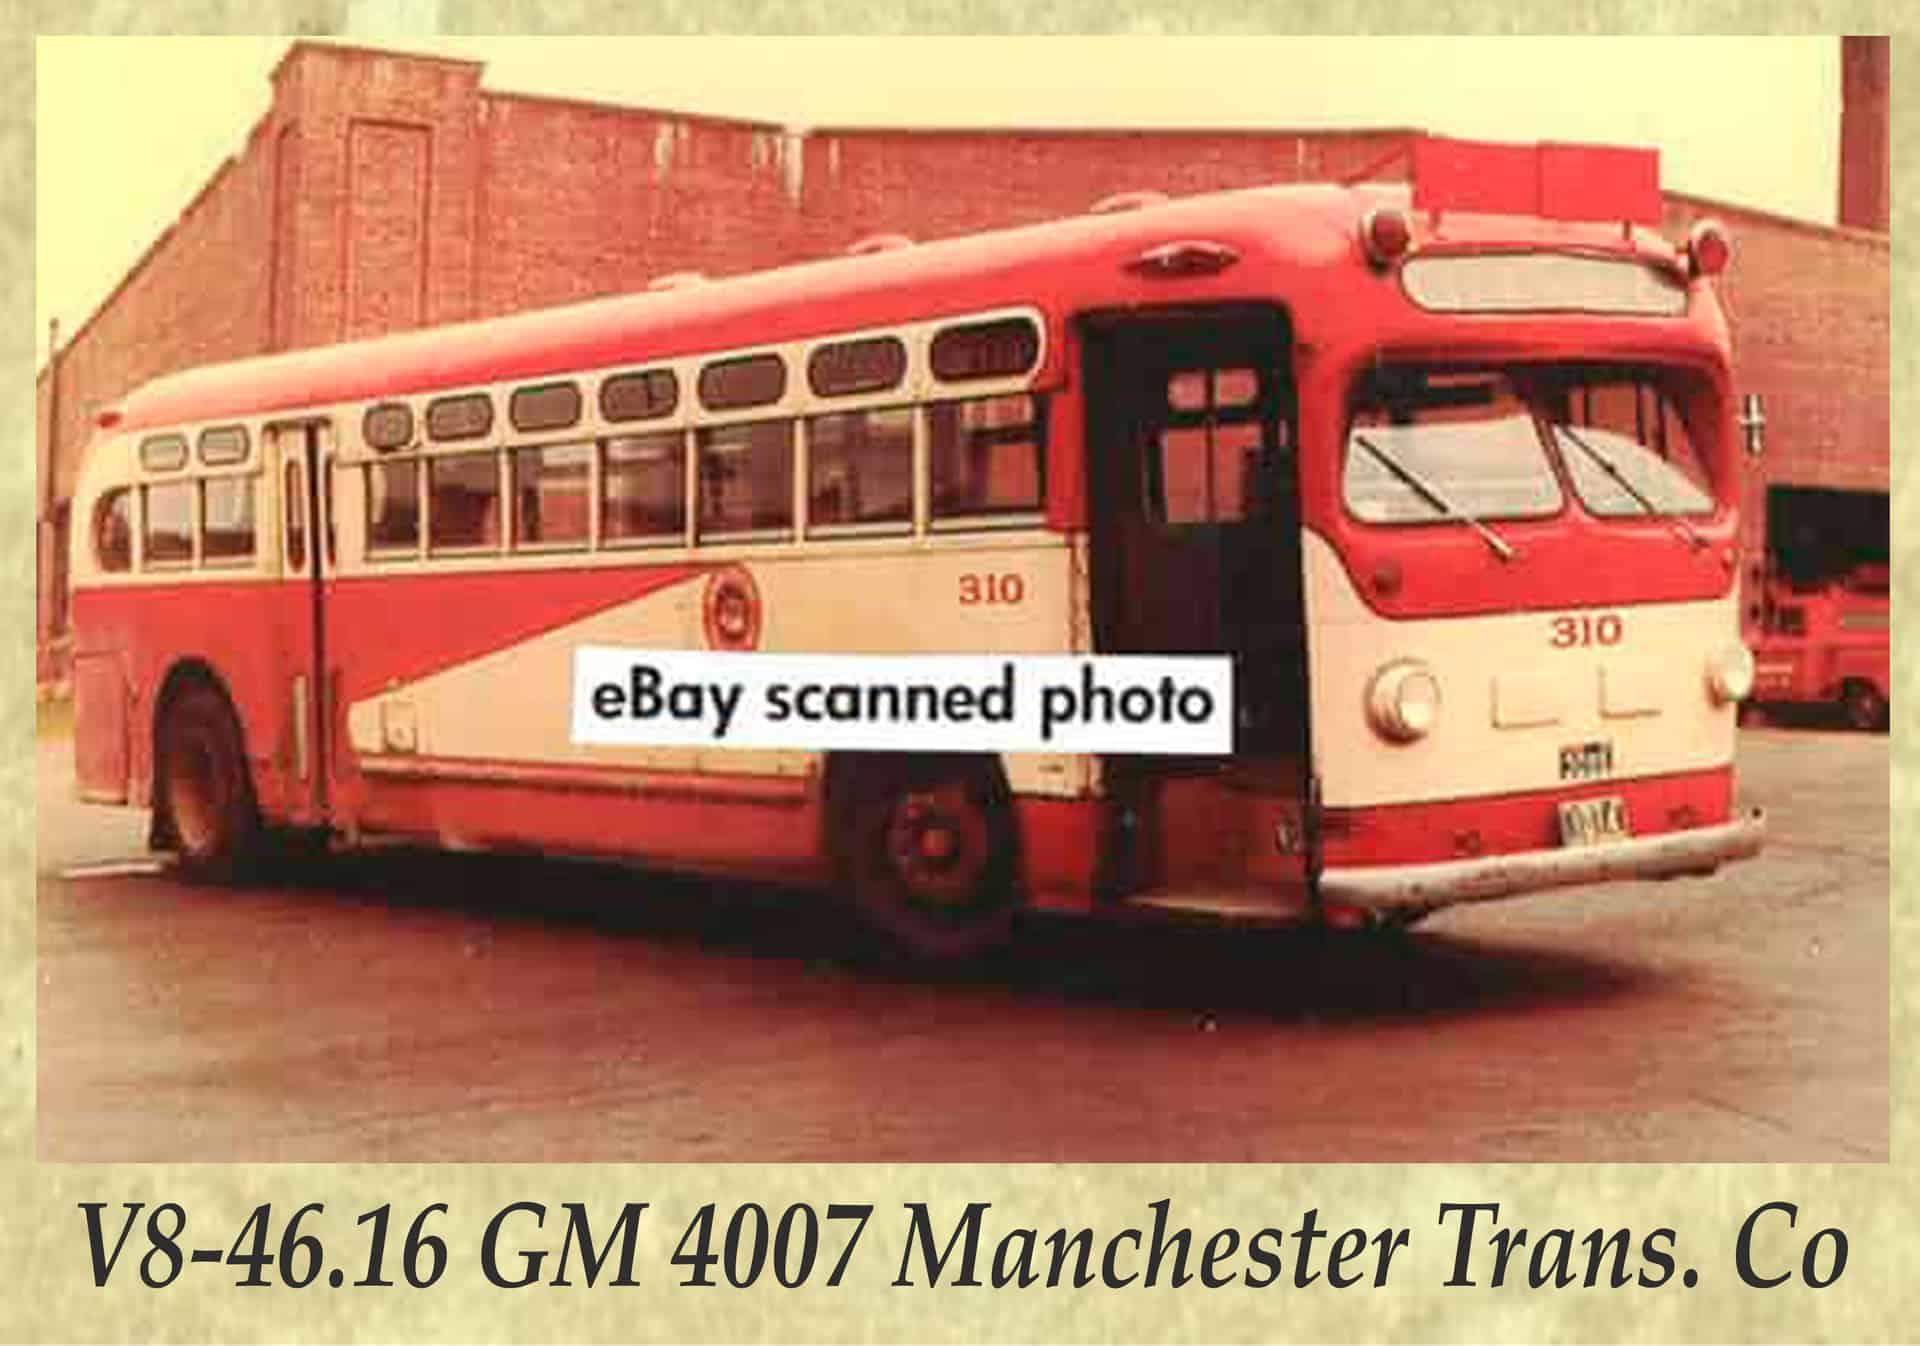 V8-46.16 GM 4007 Manchester Trans. Co